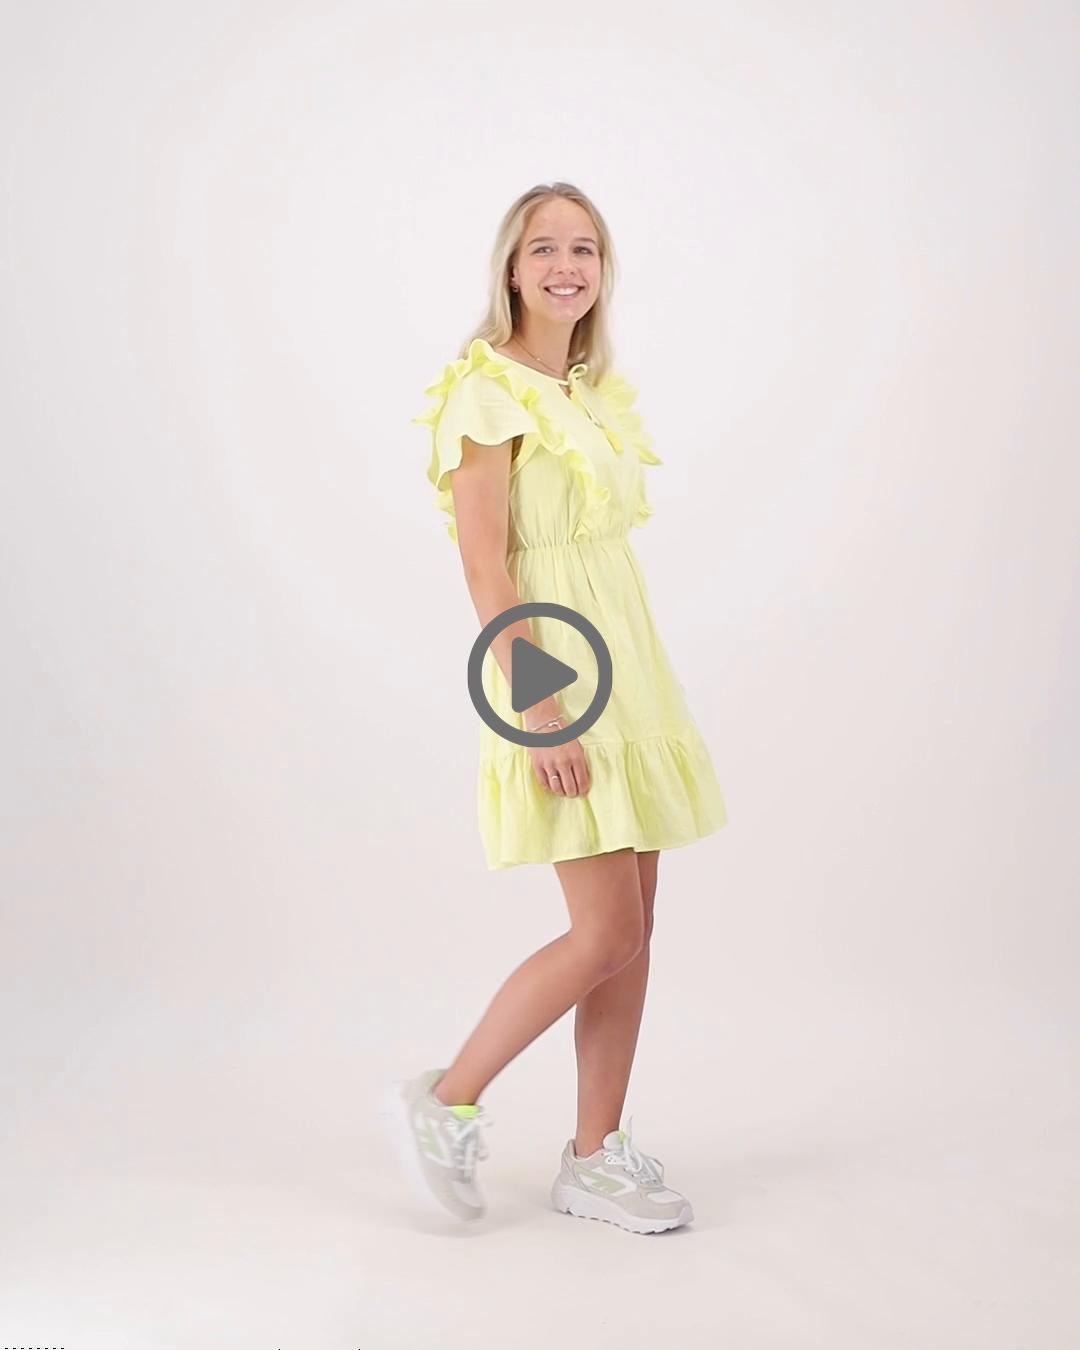 Colourful Rebel 10397 - Viva Ruffle Mini Dress - Yellow